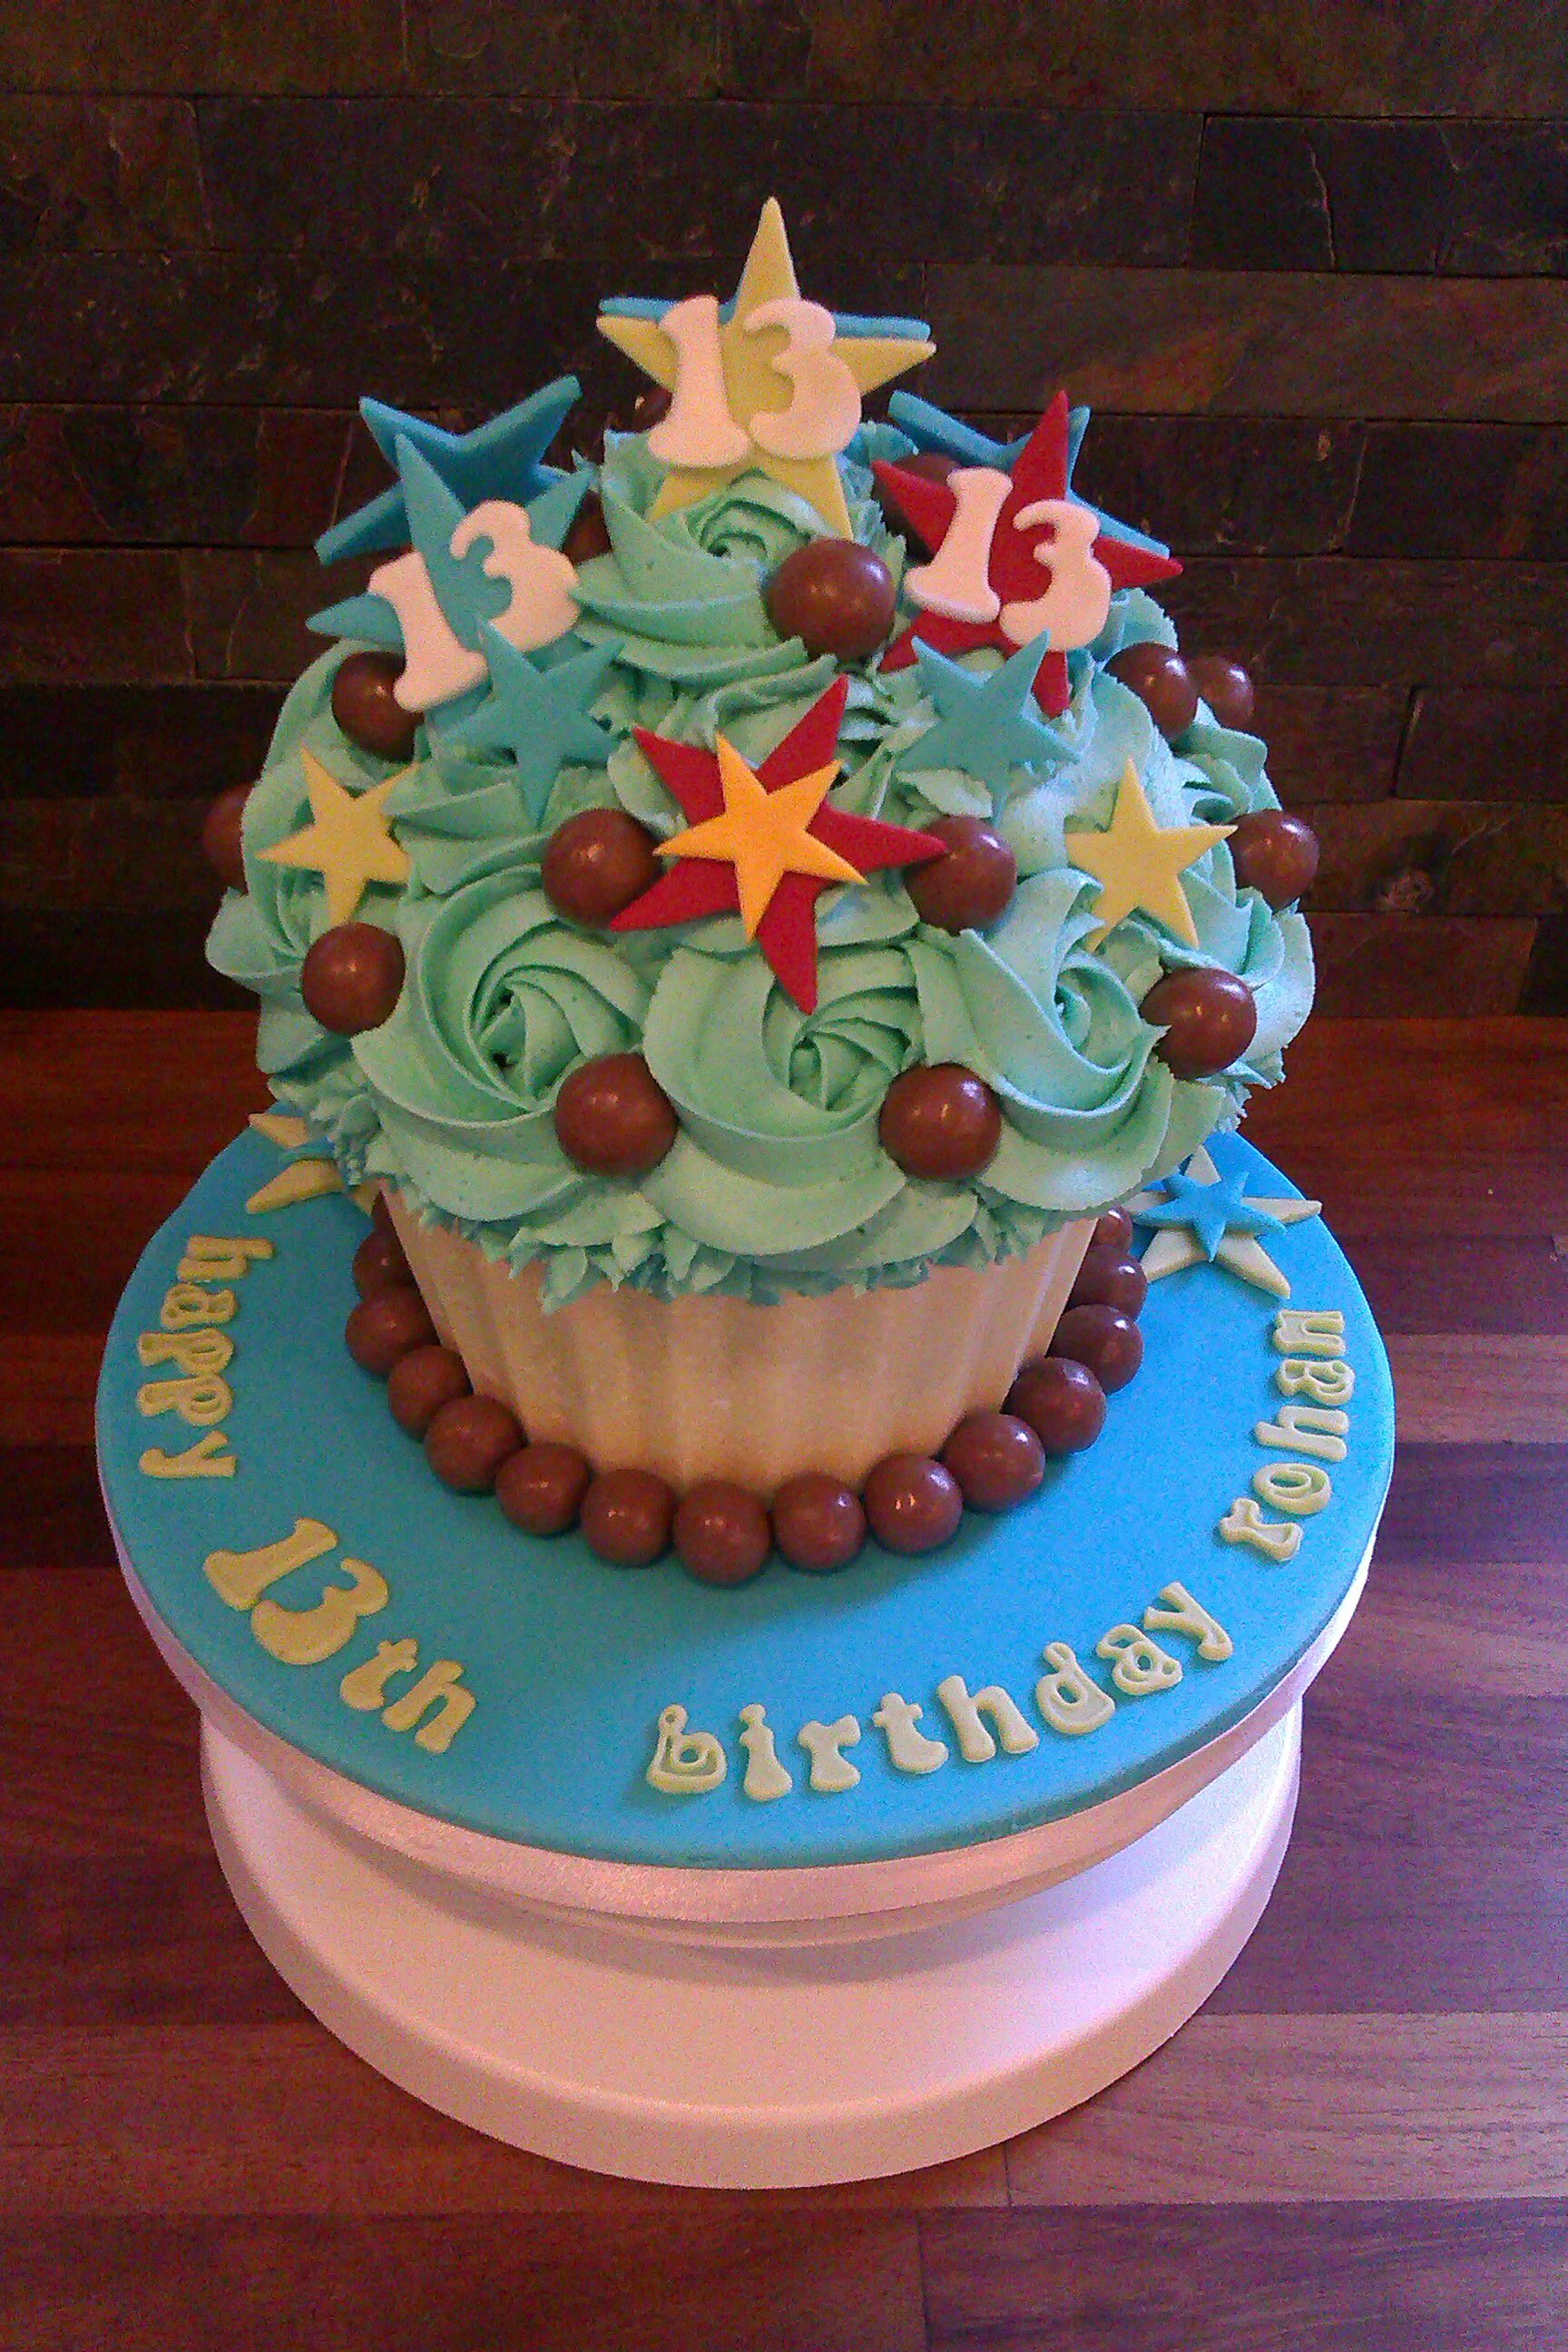 Giant Cupcake Big cupcake, Cake, Cake inspiration